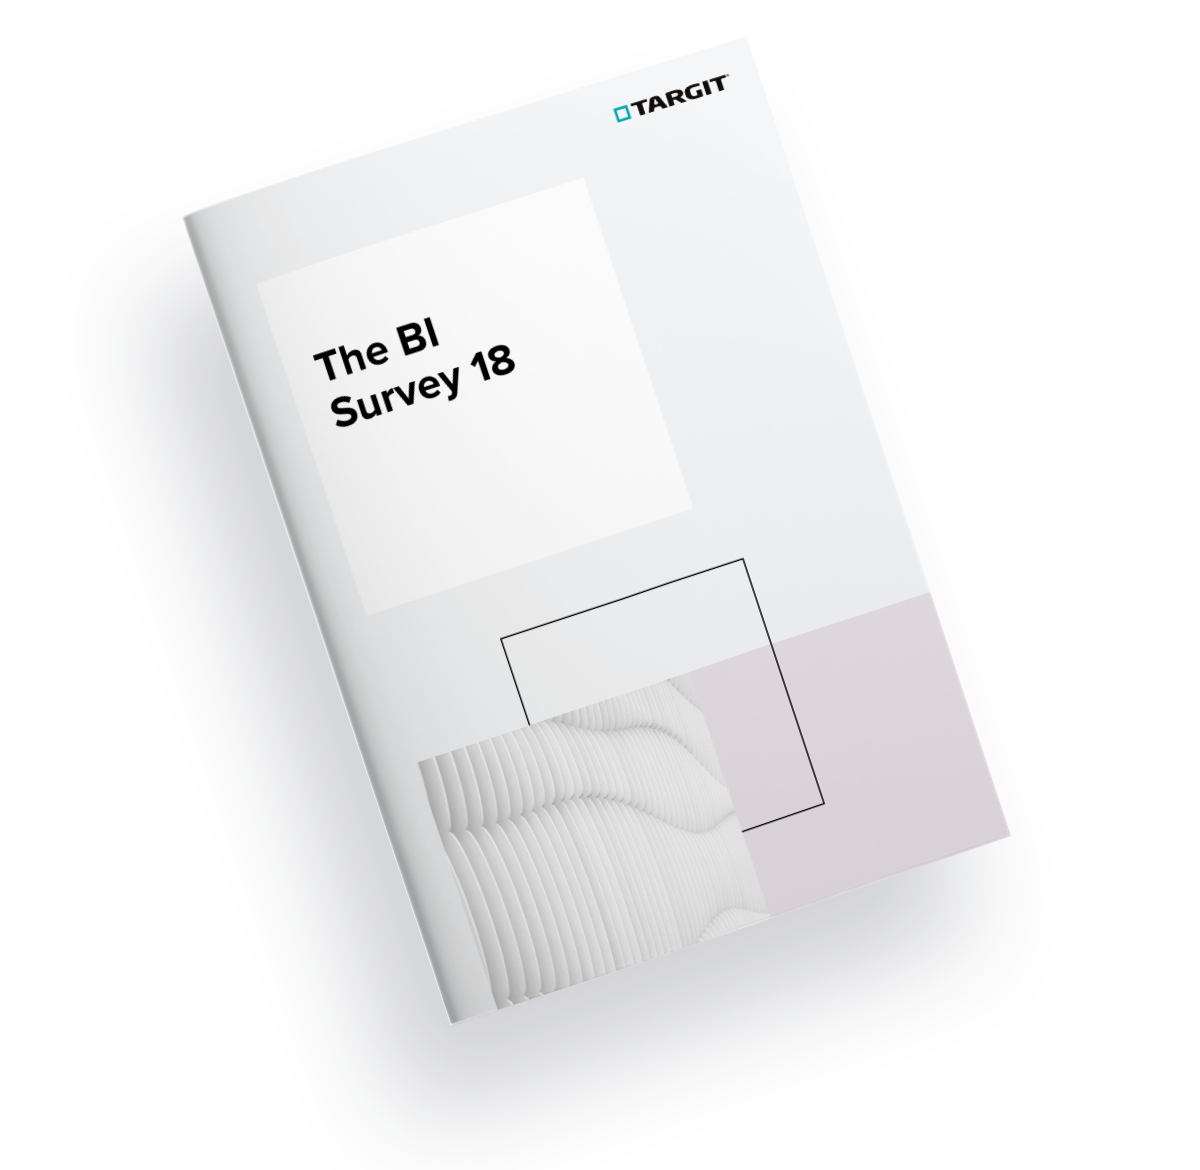 The BI Survey 18 cover